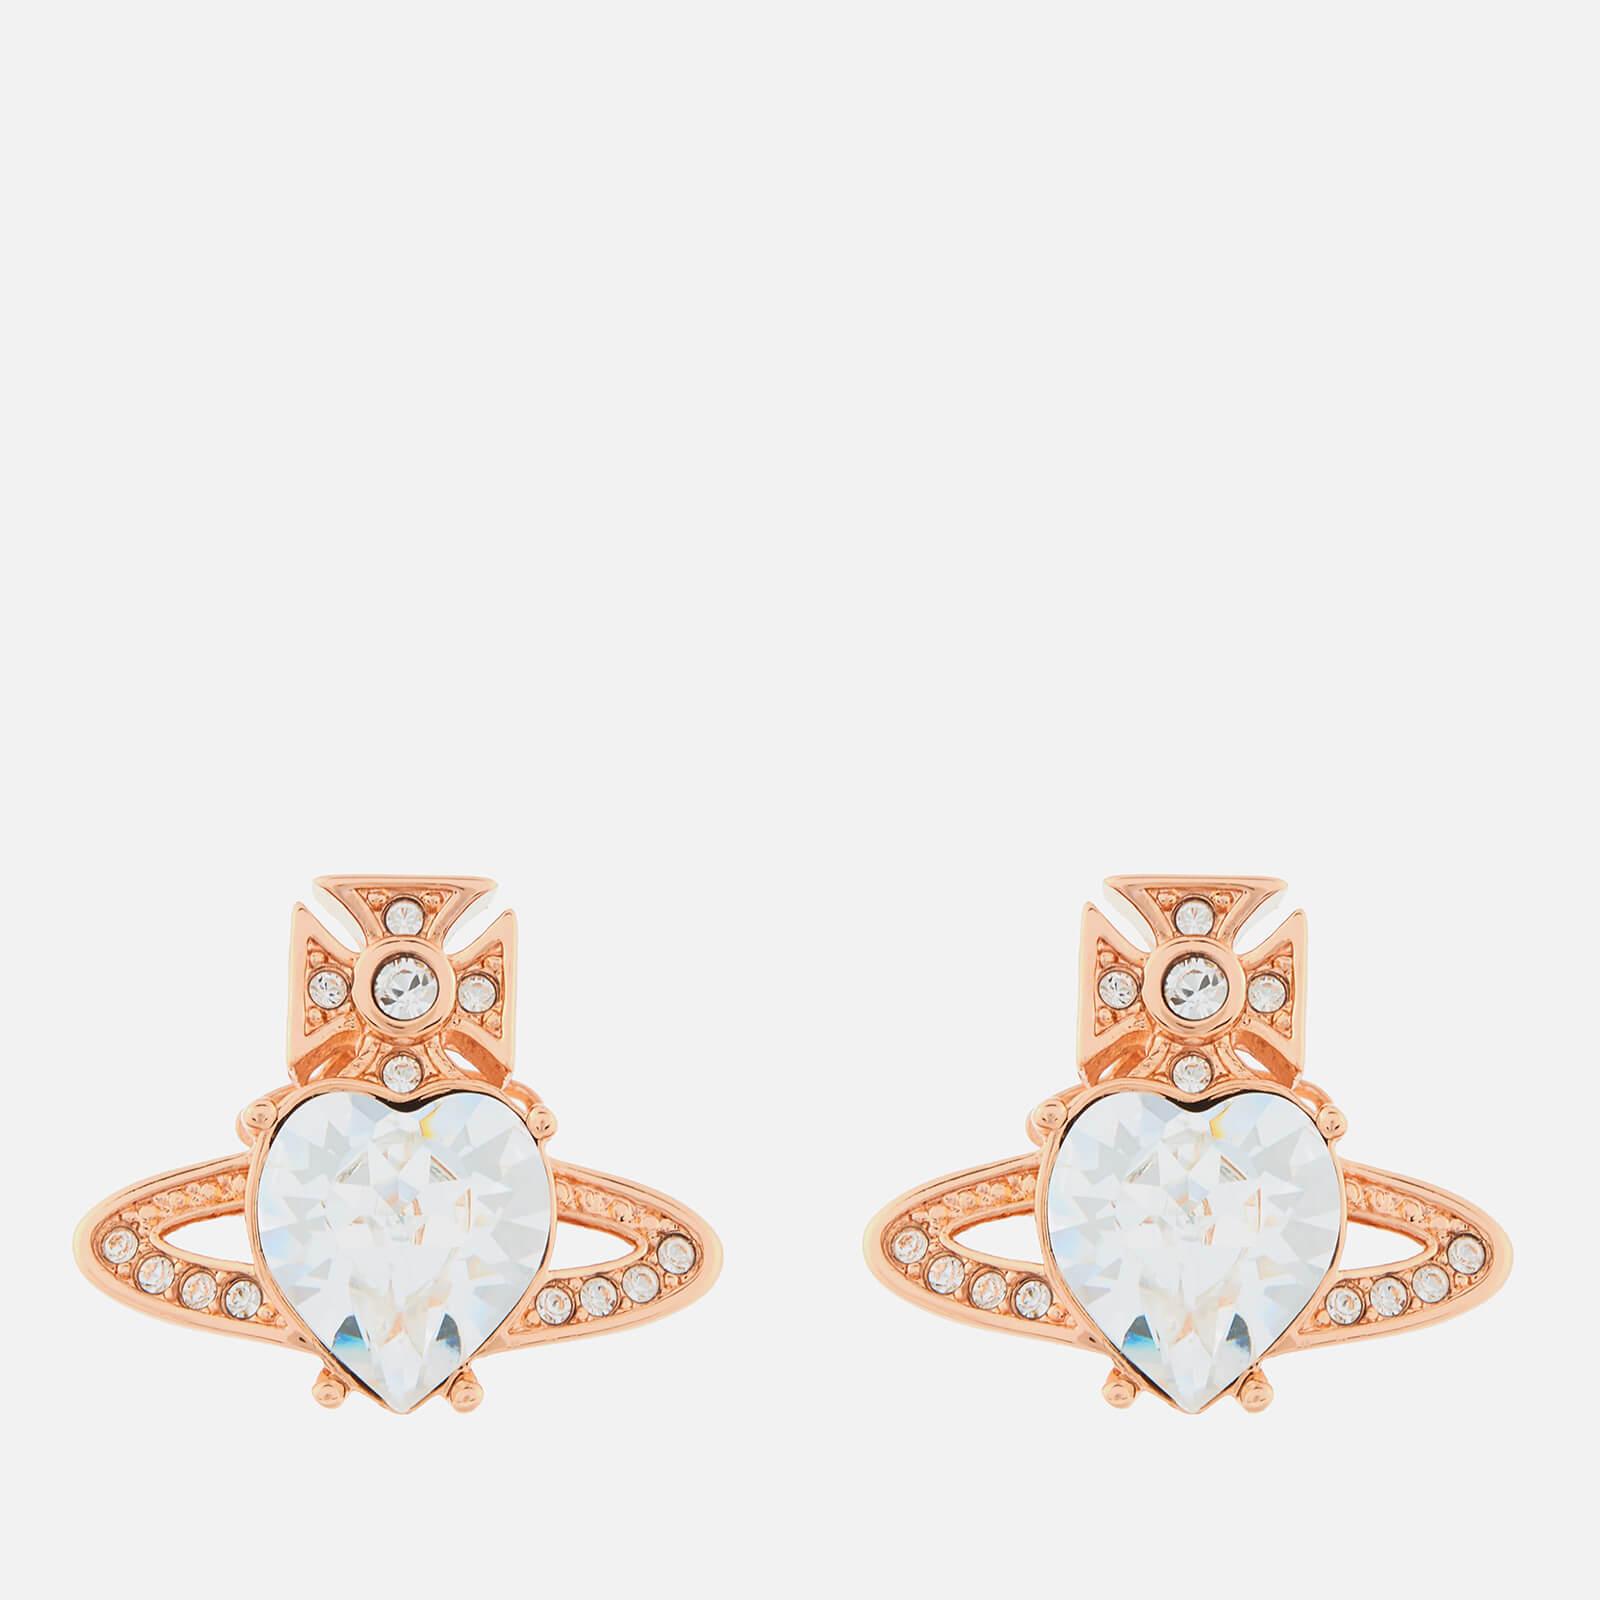 Vivienne Westwood Women's Ariella Earrings - Pink Gold Crystal